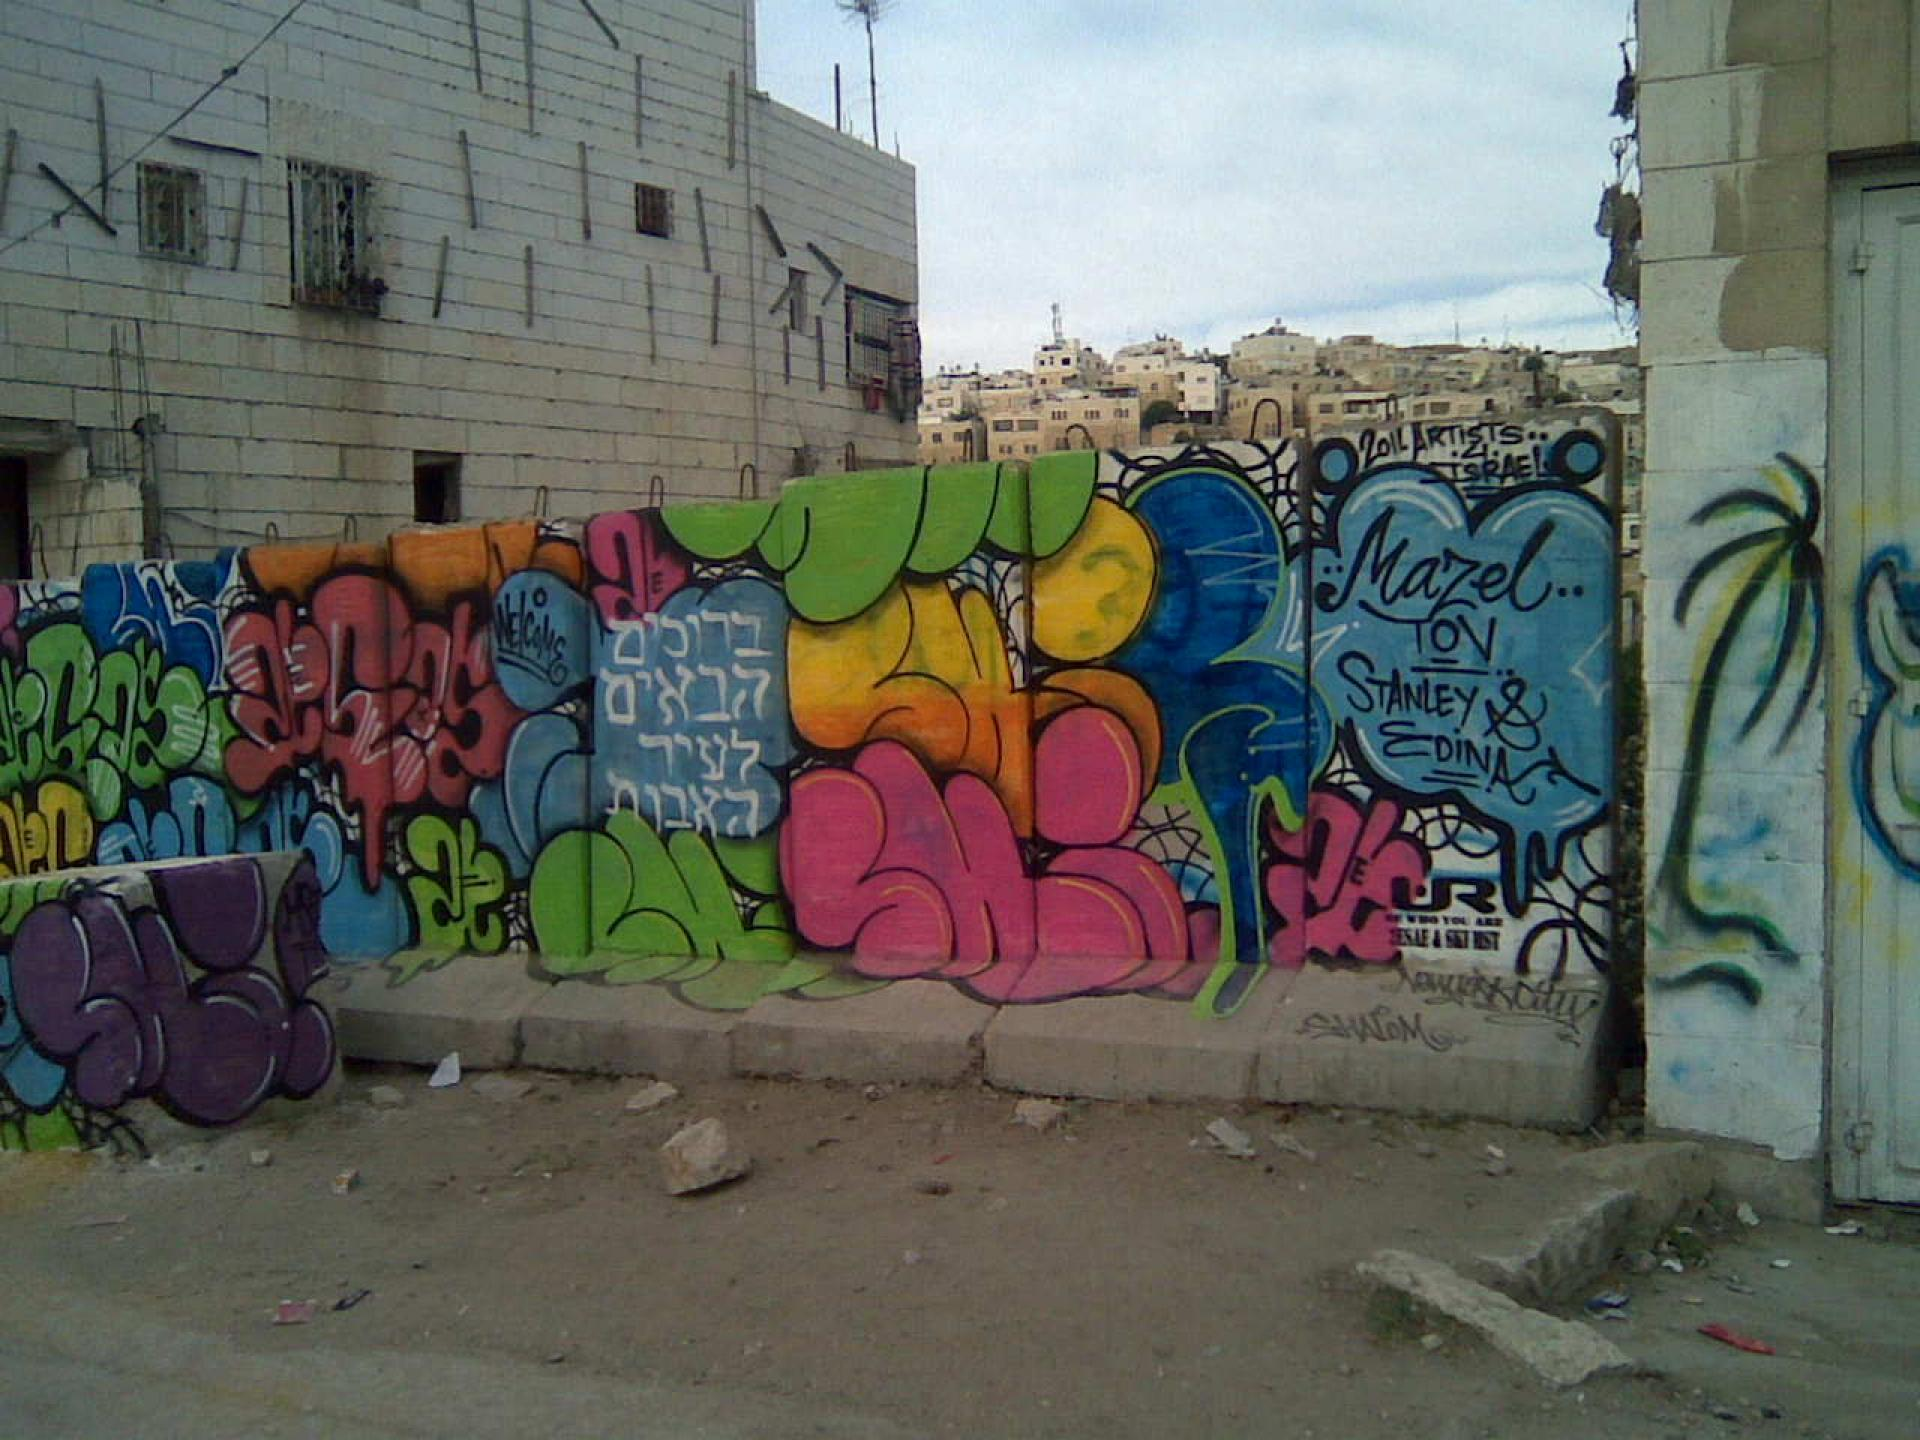 Hebron, Curve 160 22.5.11